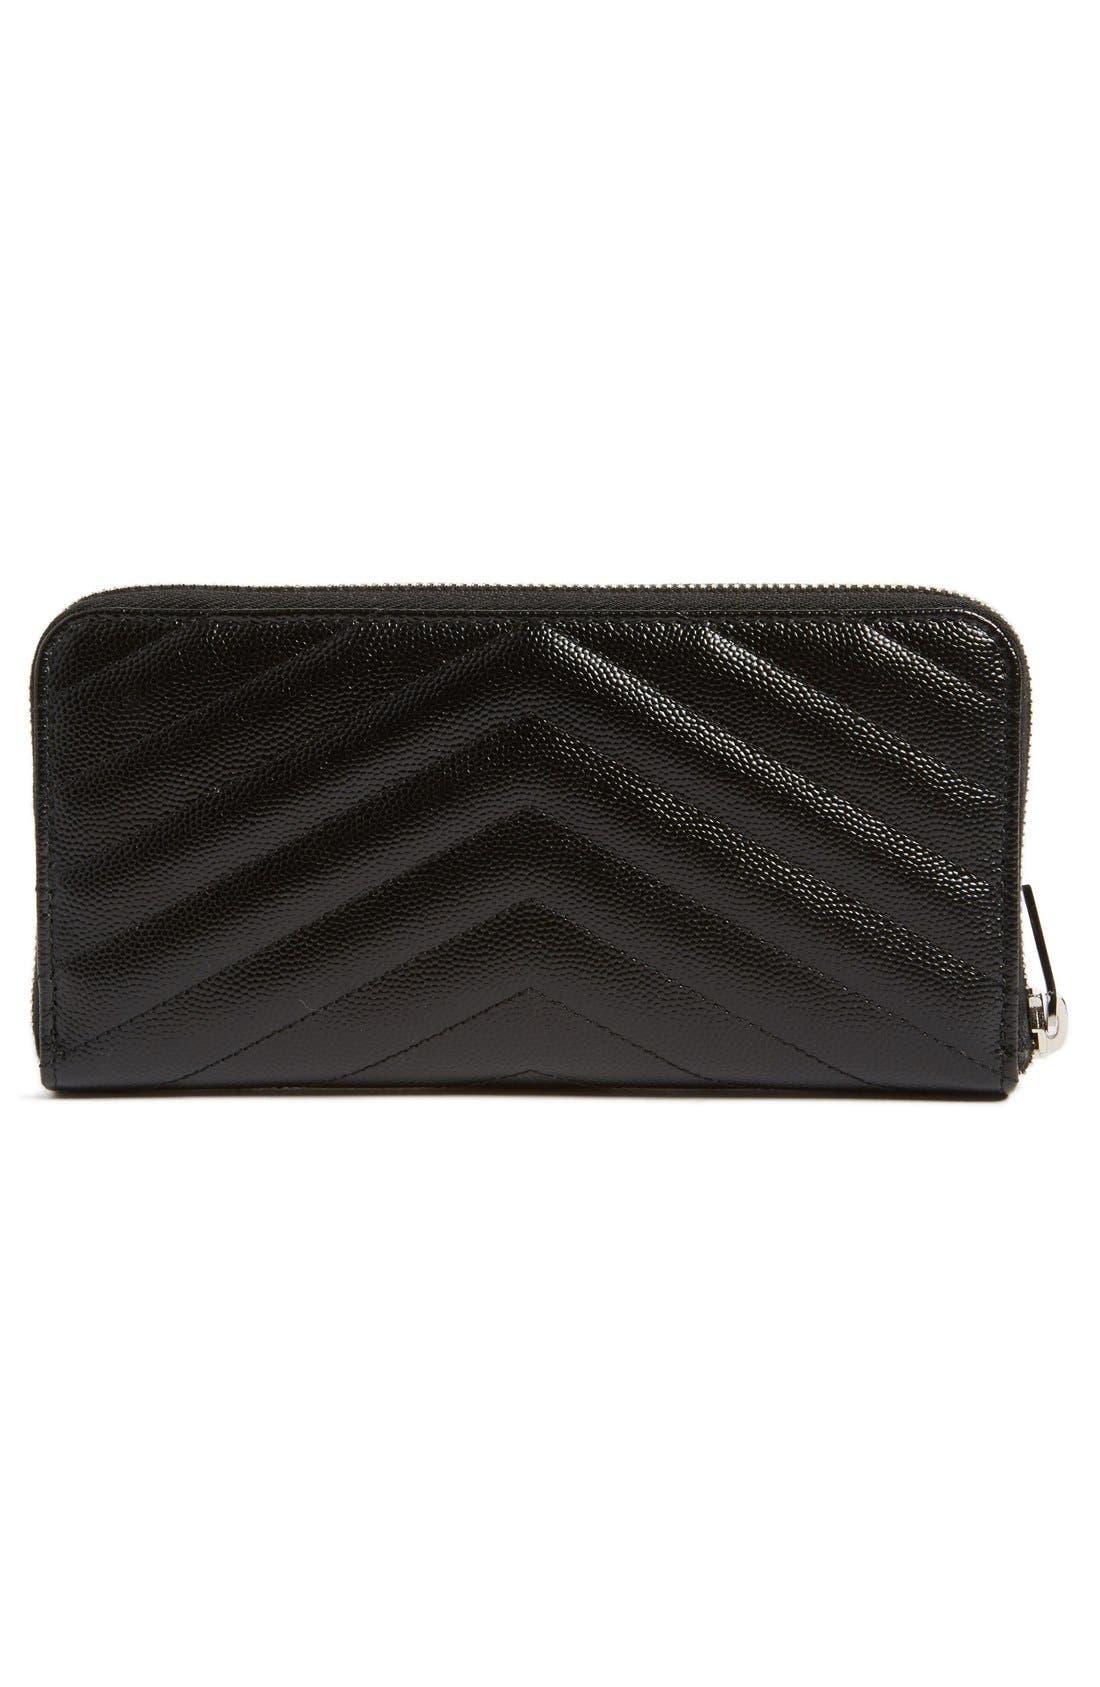 Alternate Image 4  - Saint Laurent 'Monogram' Zip Around Quilted Calfskin Leather Wallet